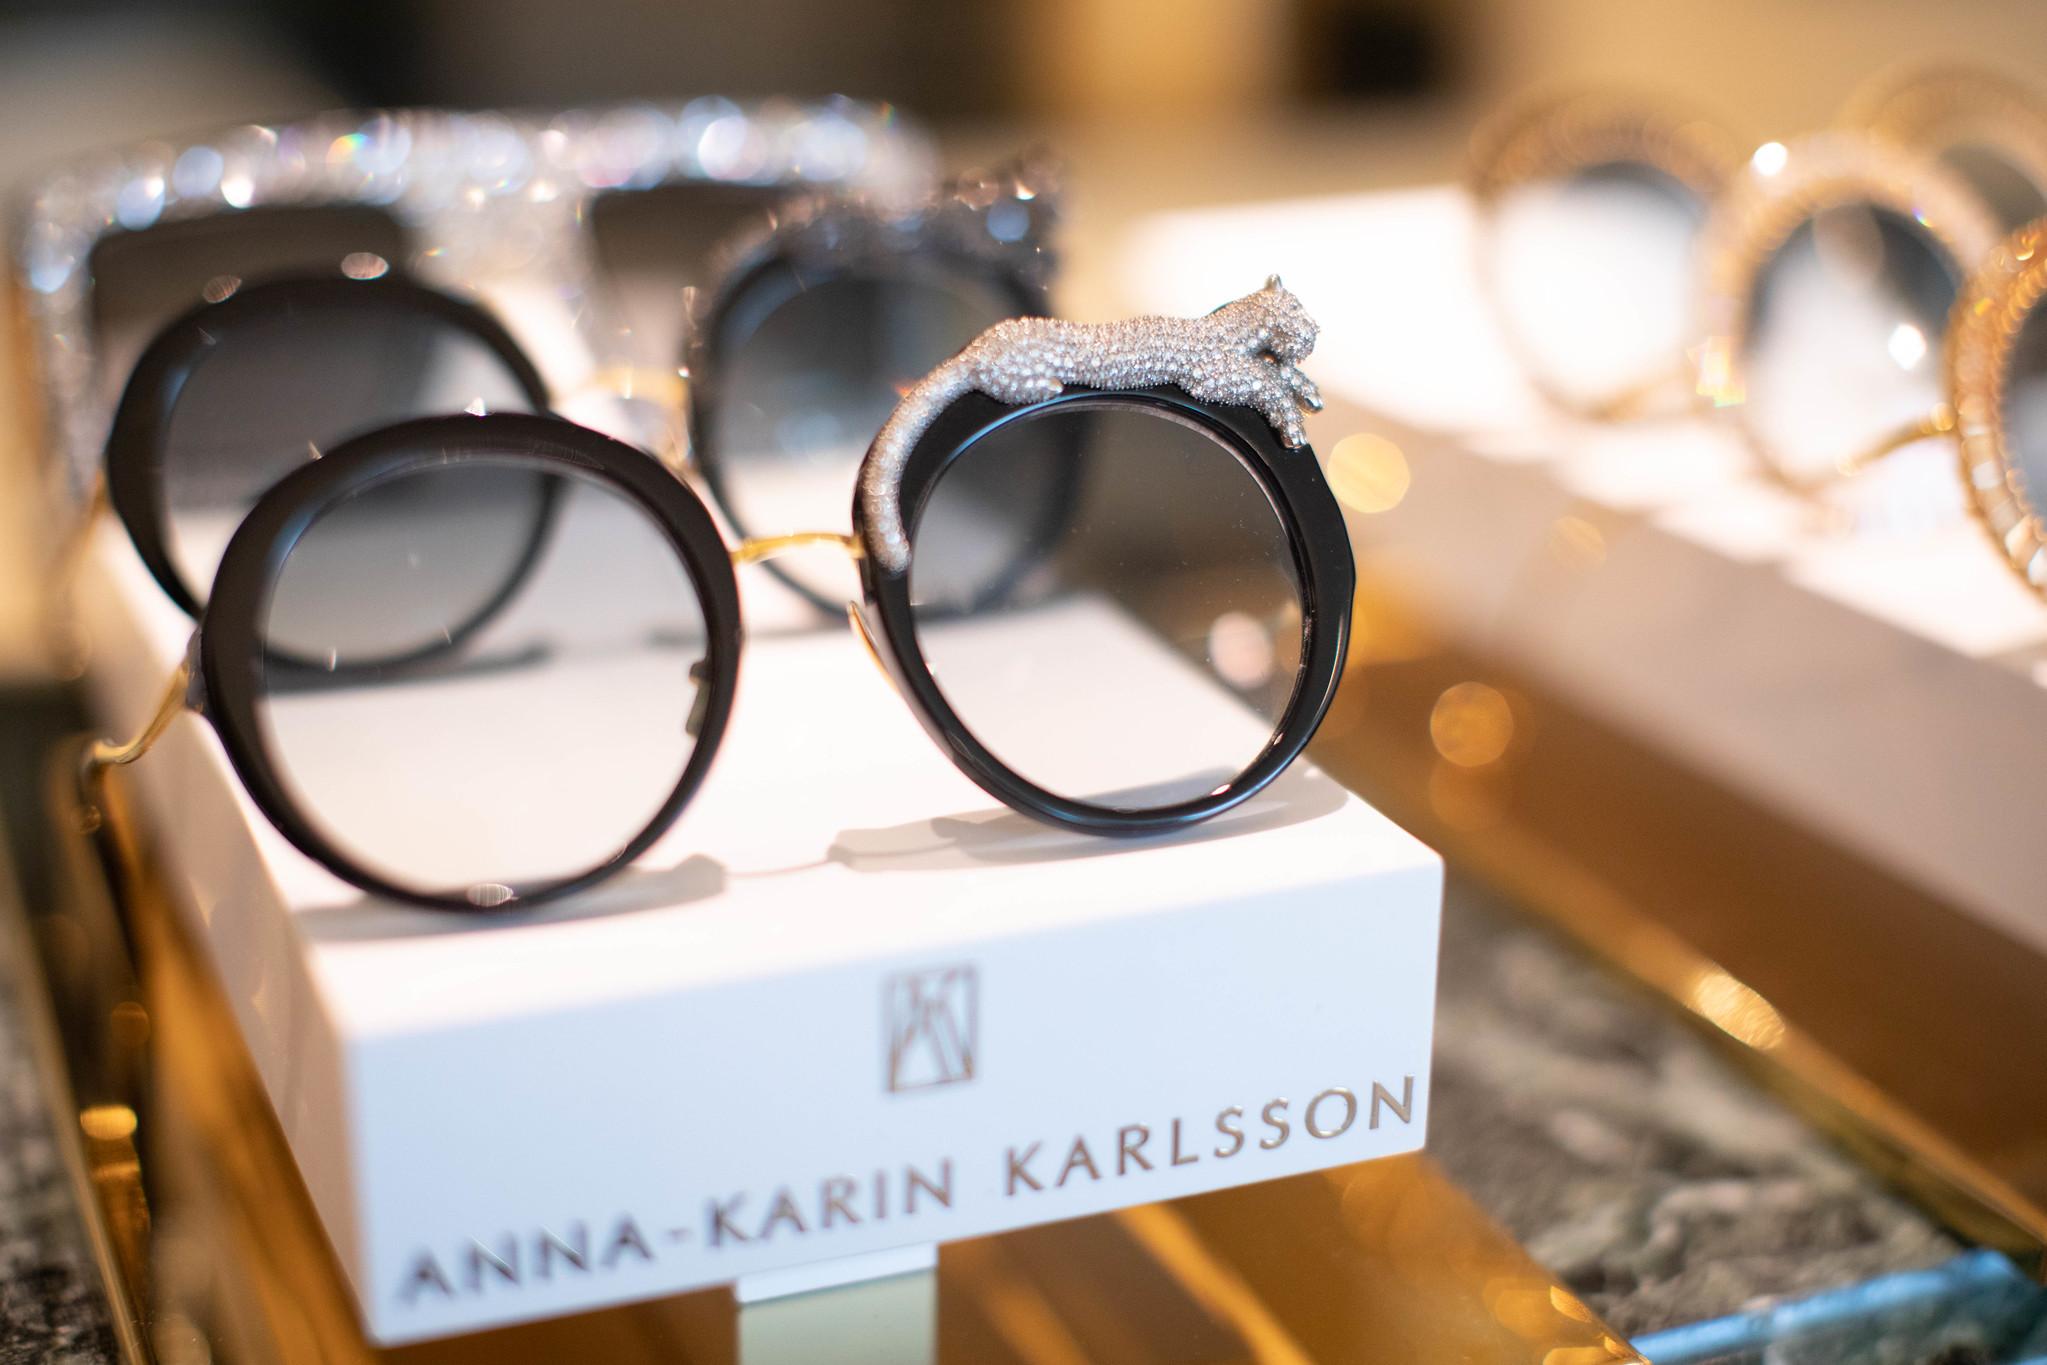 Anna-karin karlsson eyewear collection | international vision expo west 2020